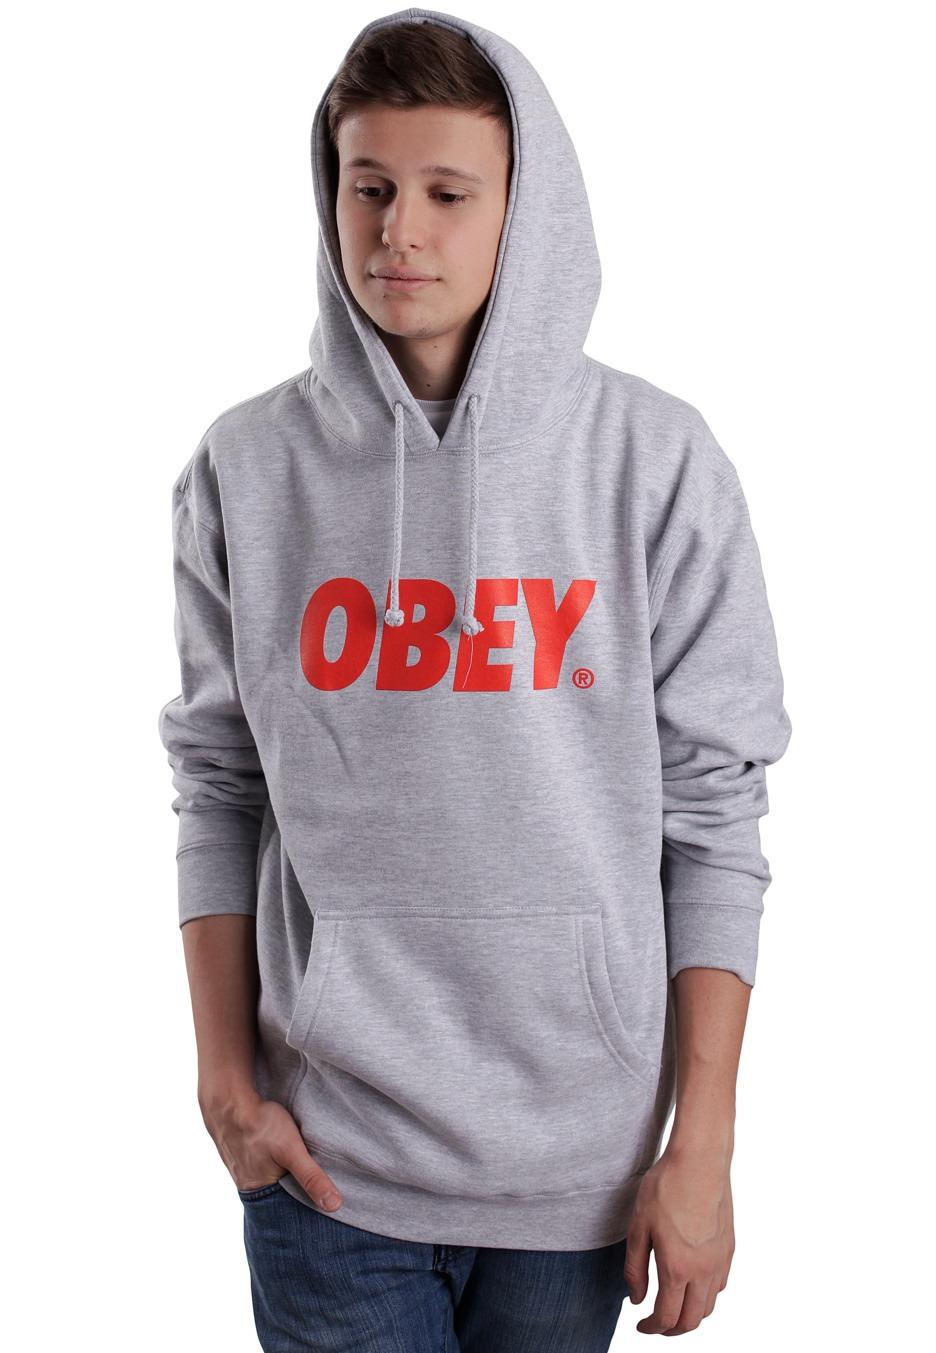 Obey hoodie red